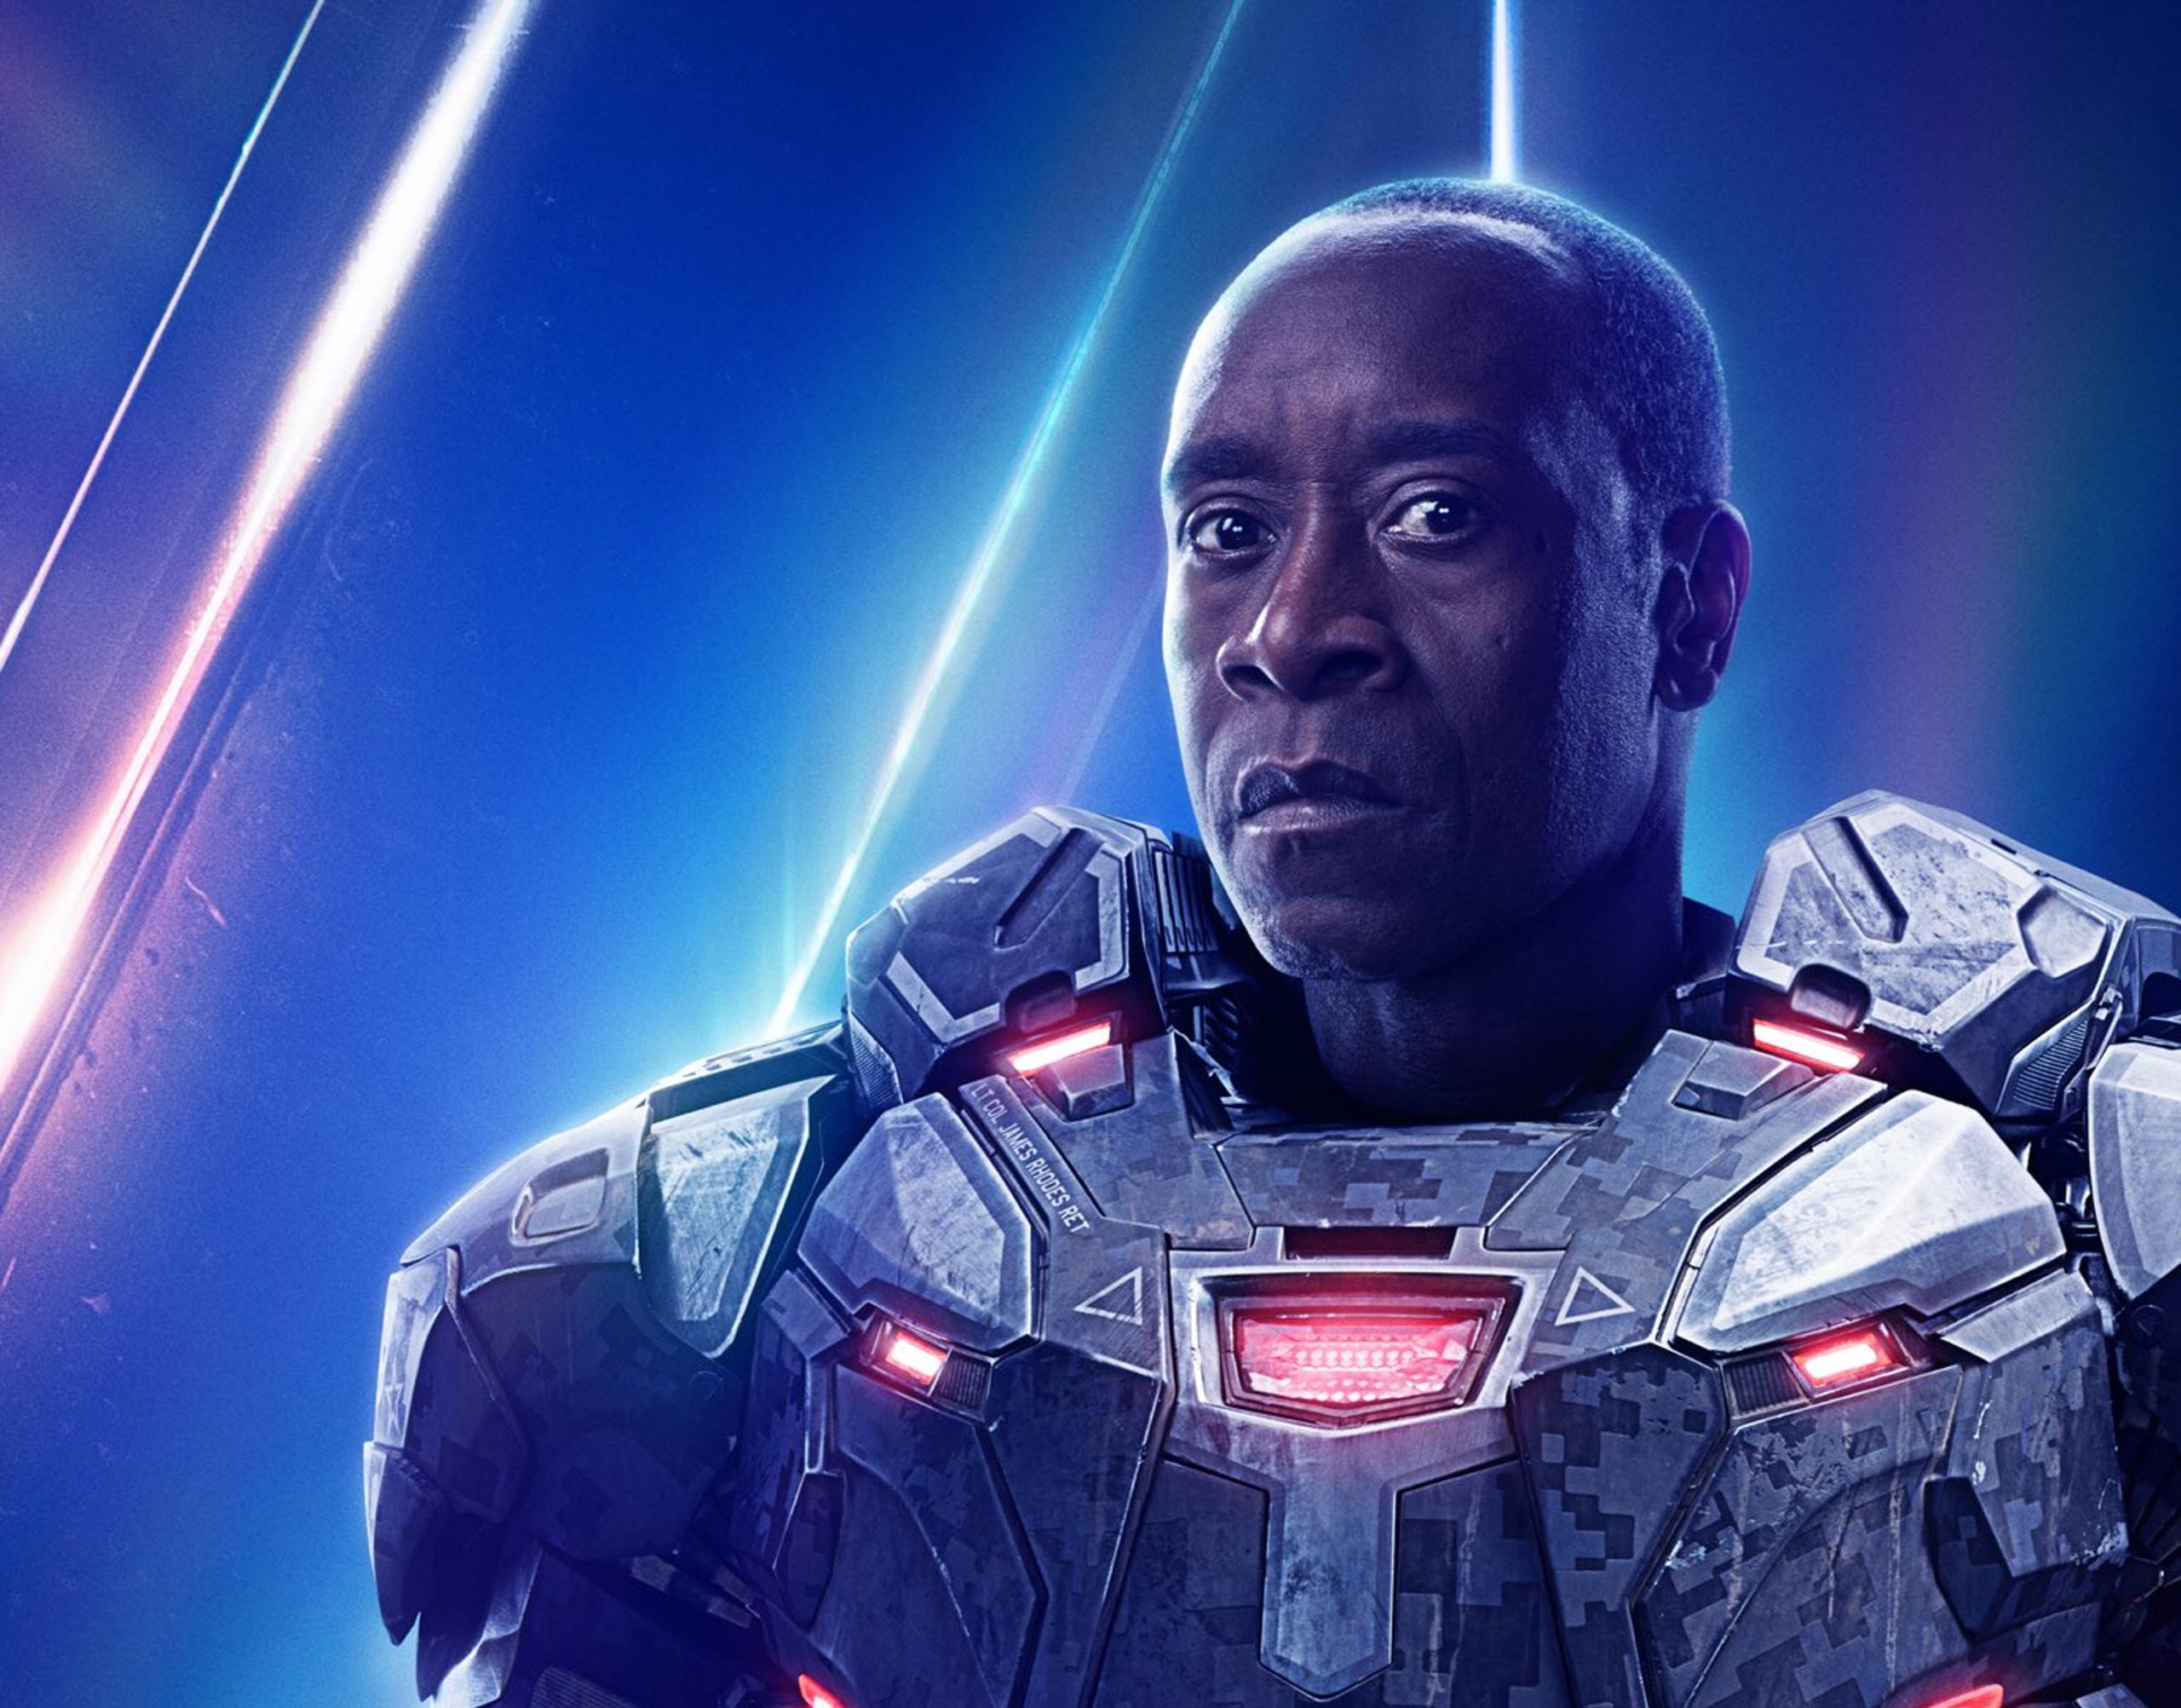 Shuri In Avengers Infinity War New Poster Hd Movies 4k: War Machine In Avengers Infinity War New Poster, HD Movies